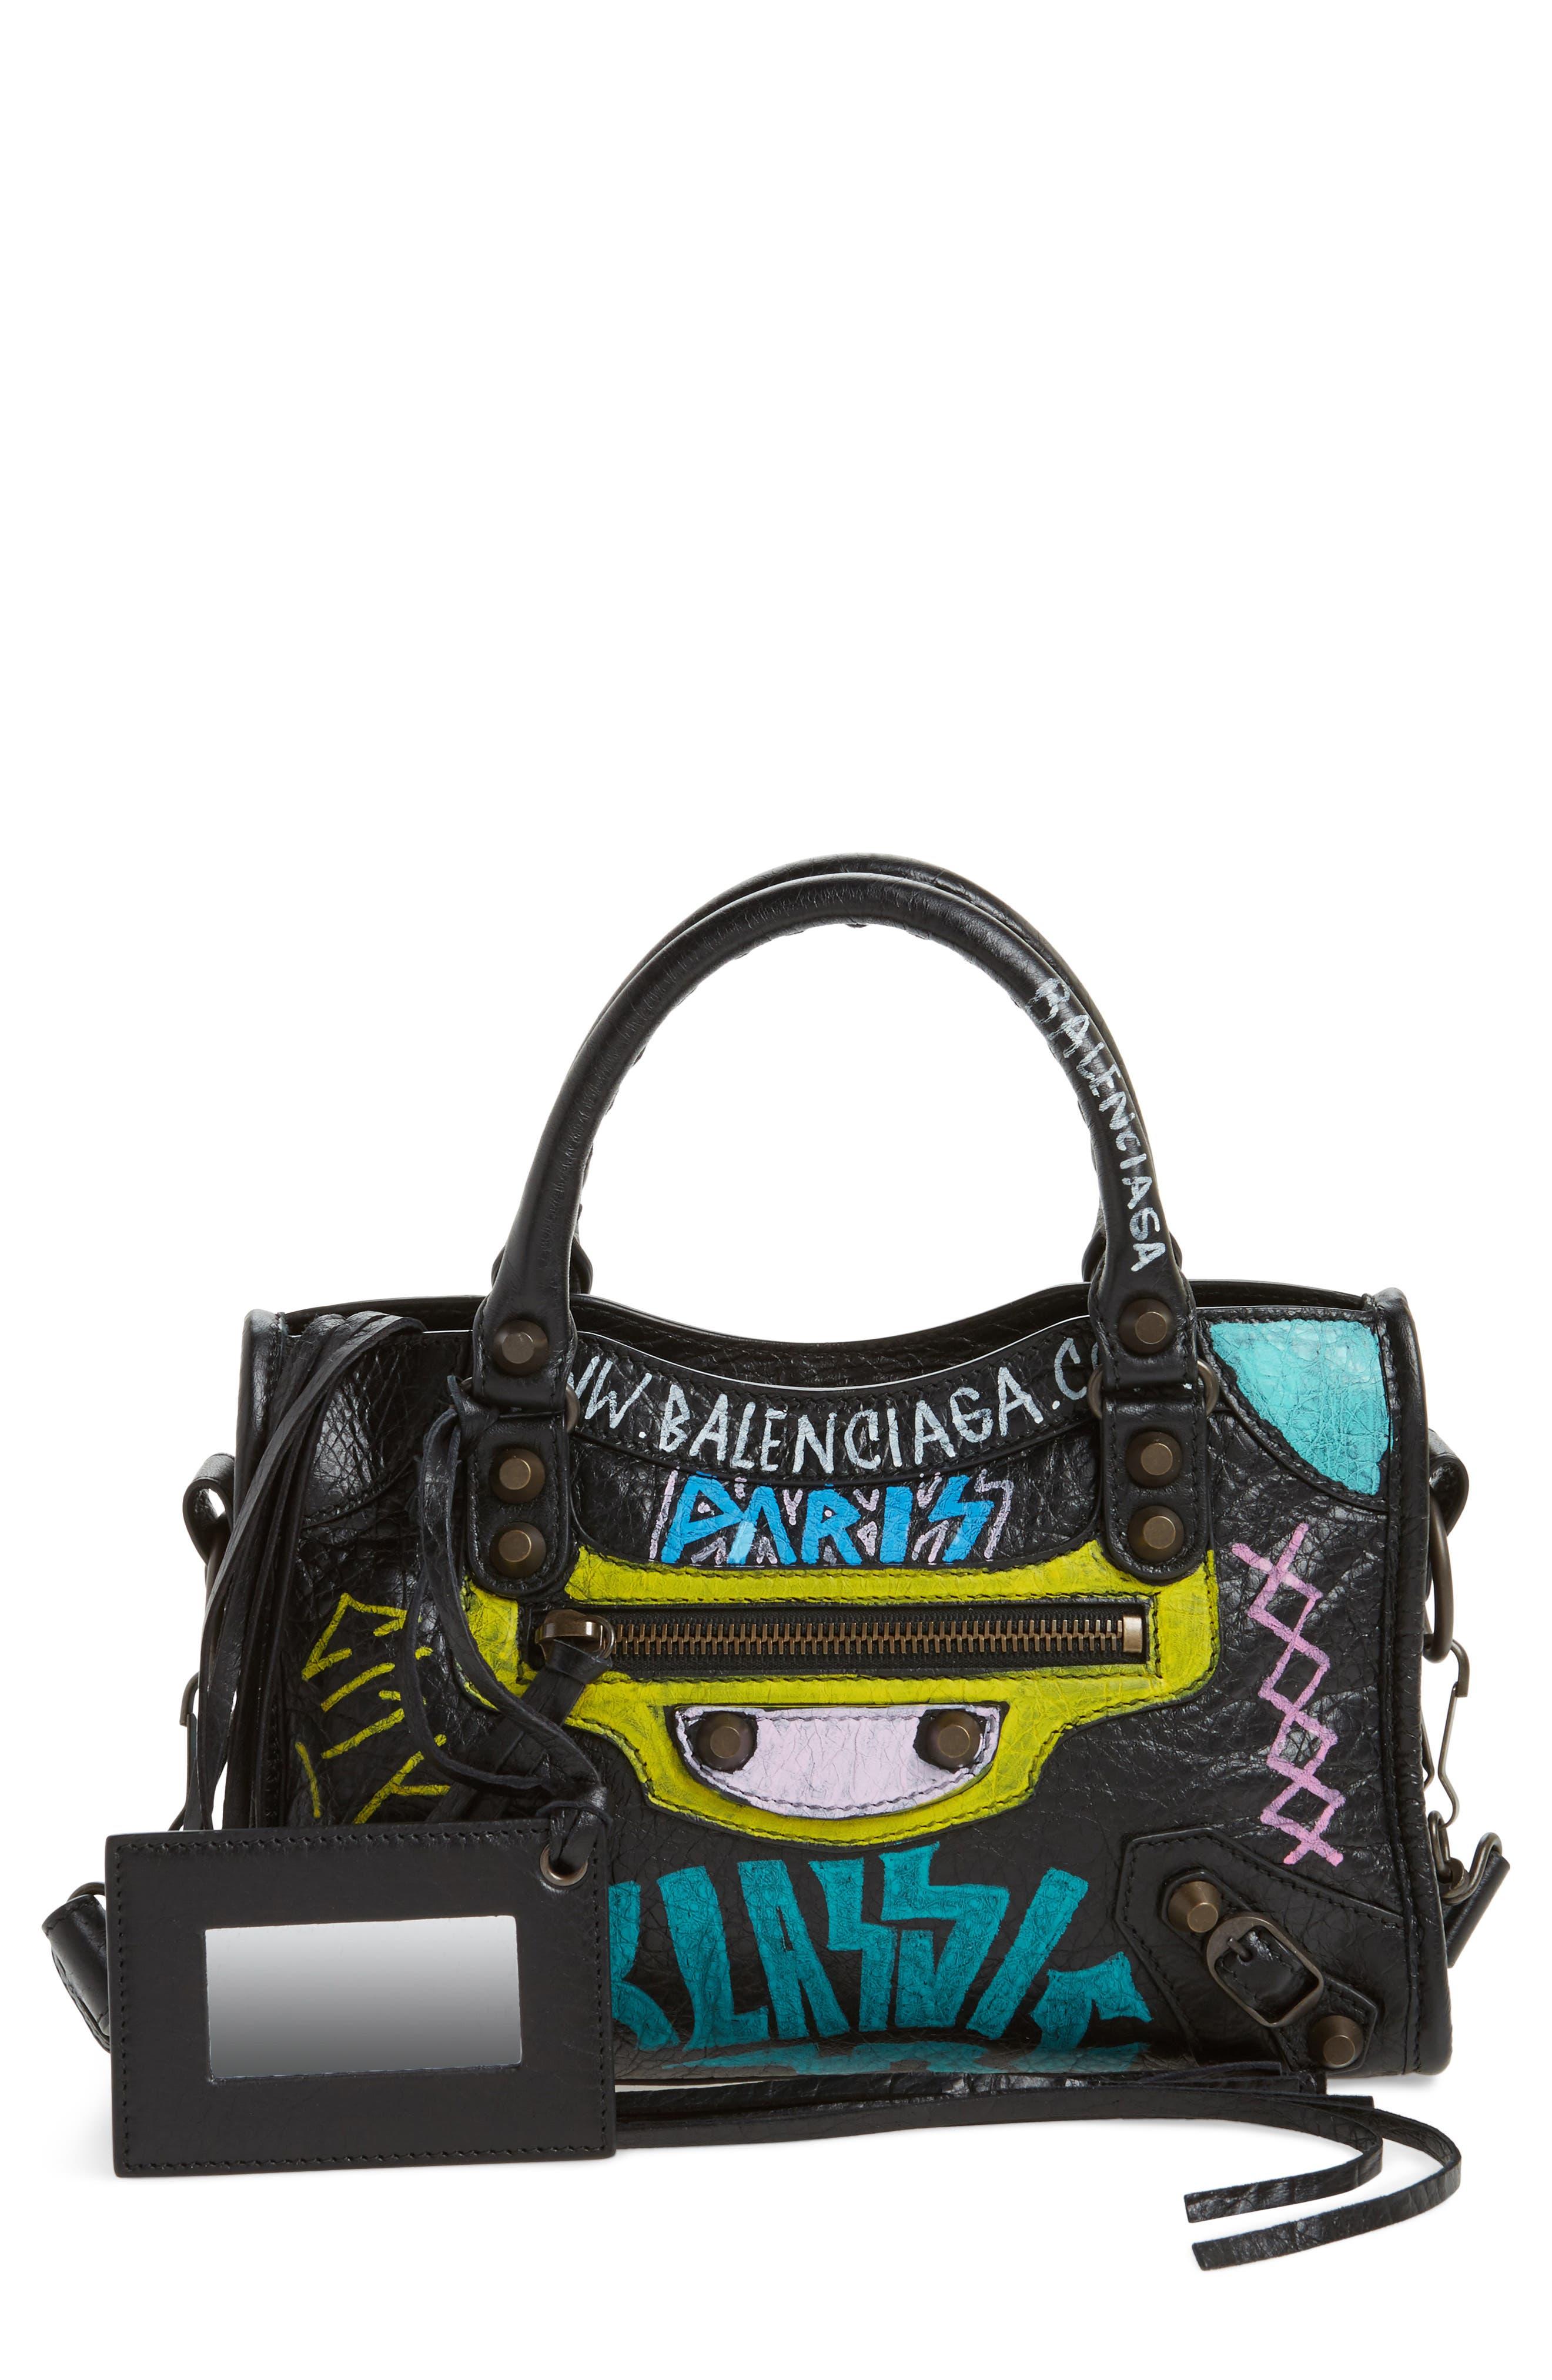 Mini City Graffiti Leather Tote,                             Main thumbnail 1, color,                             Noir/ Multi Color